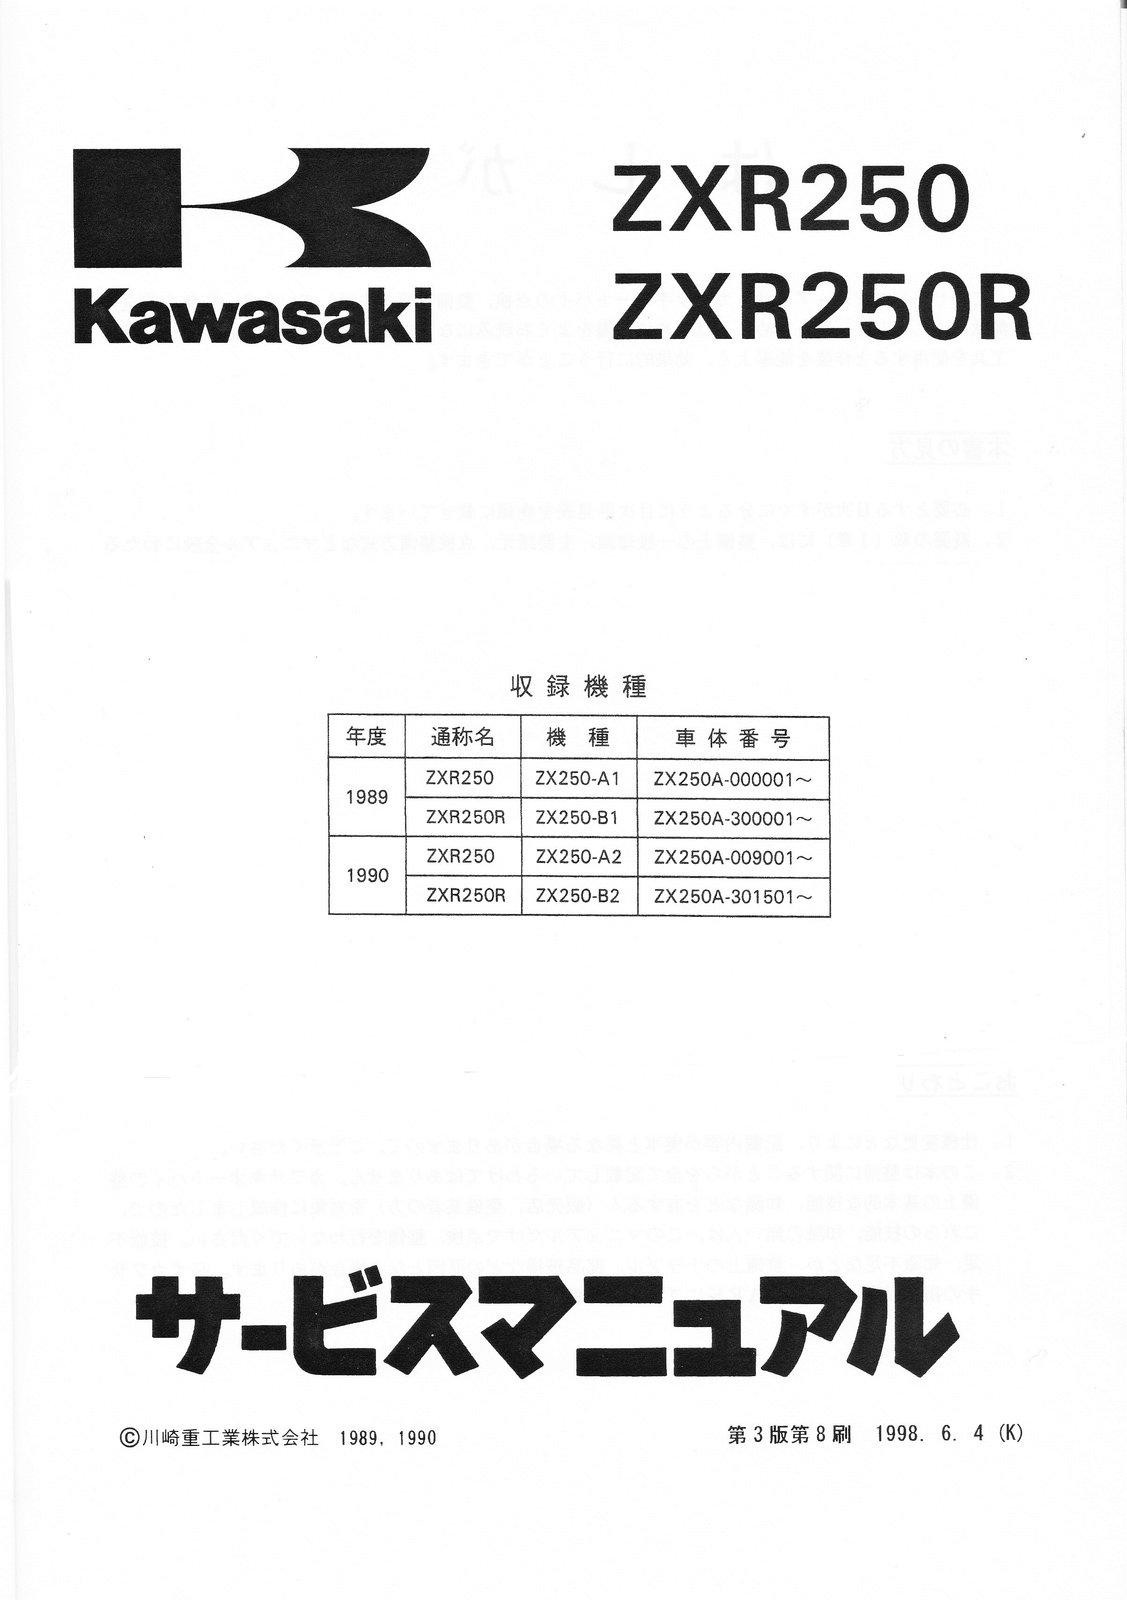 ZXR250A cover.jpg